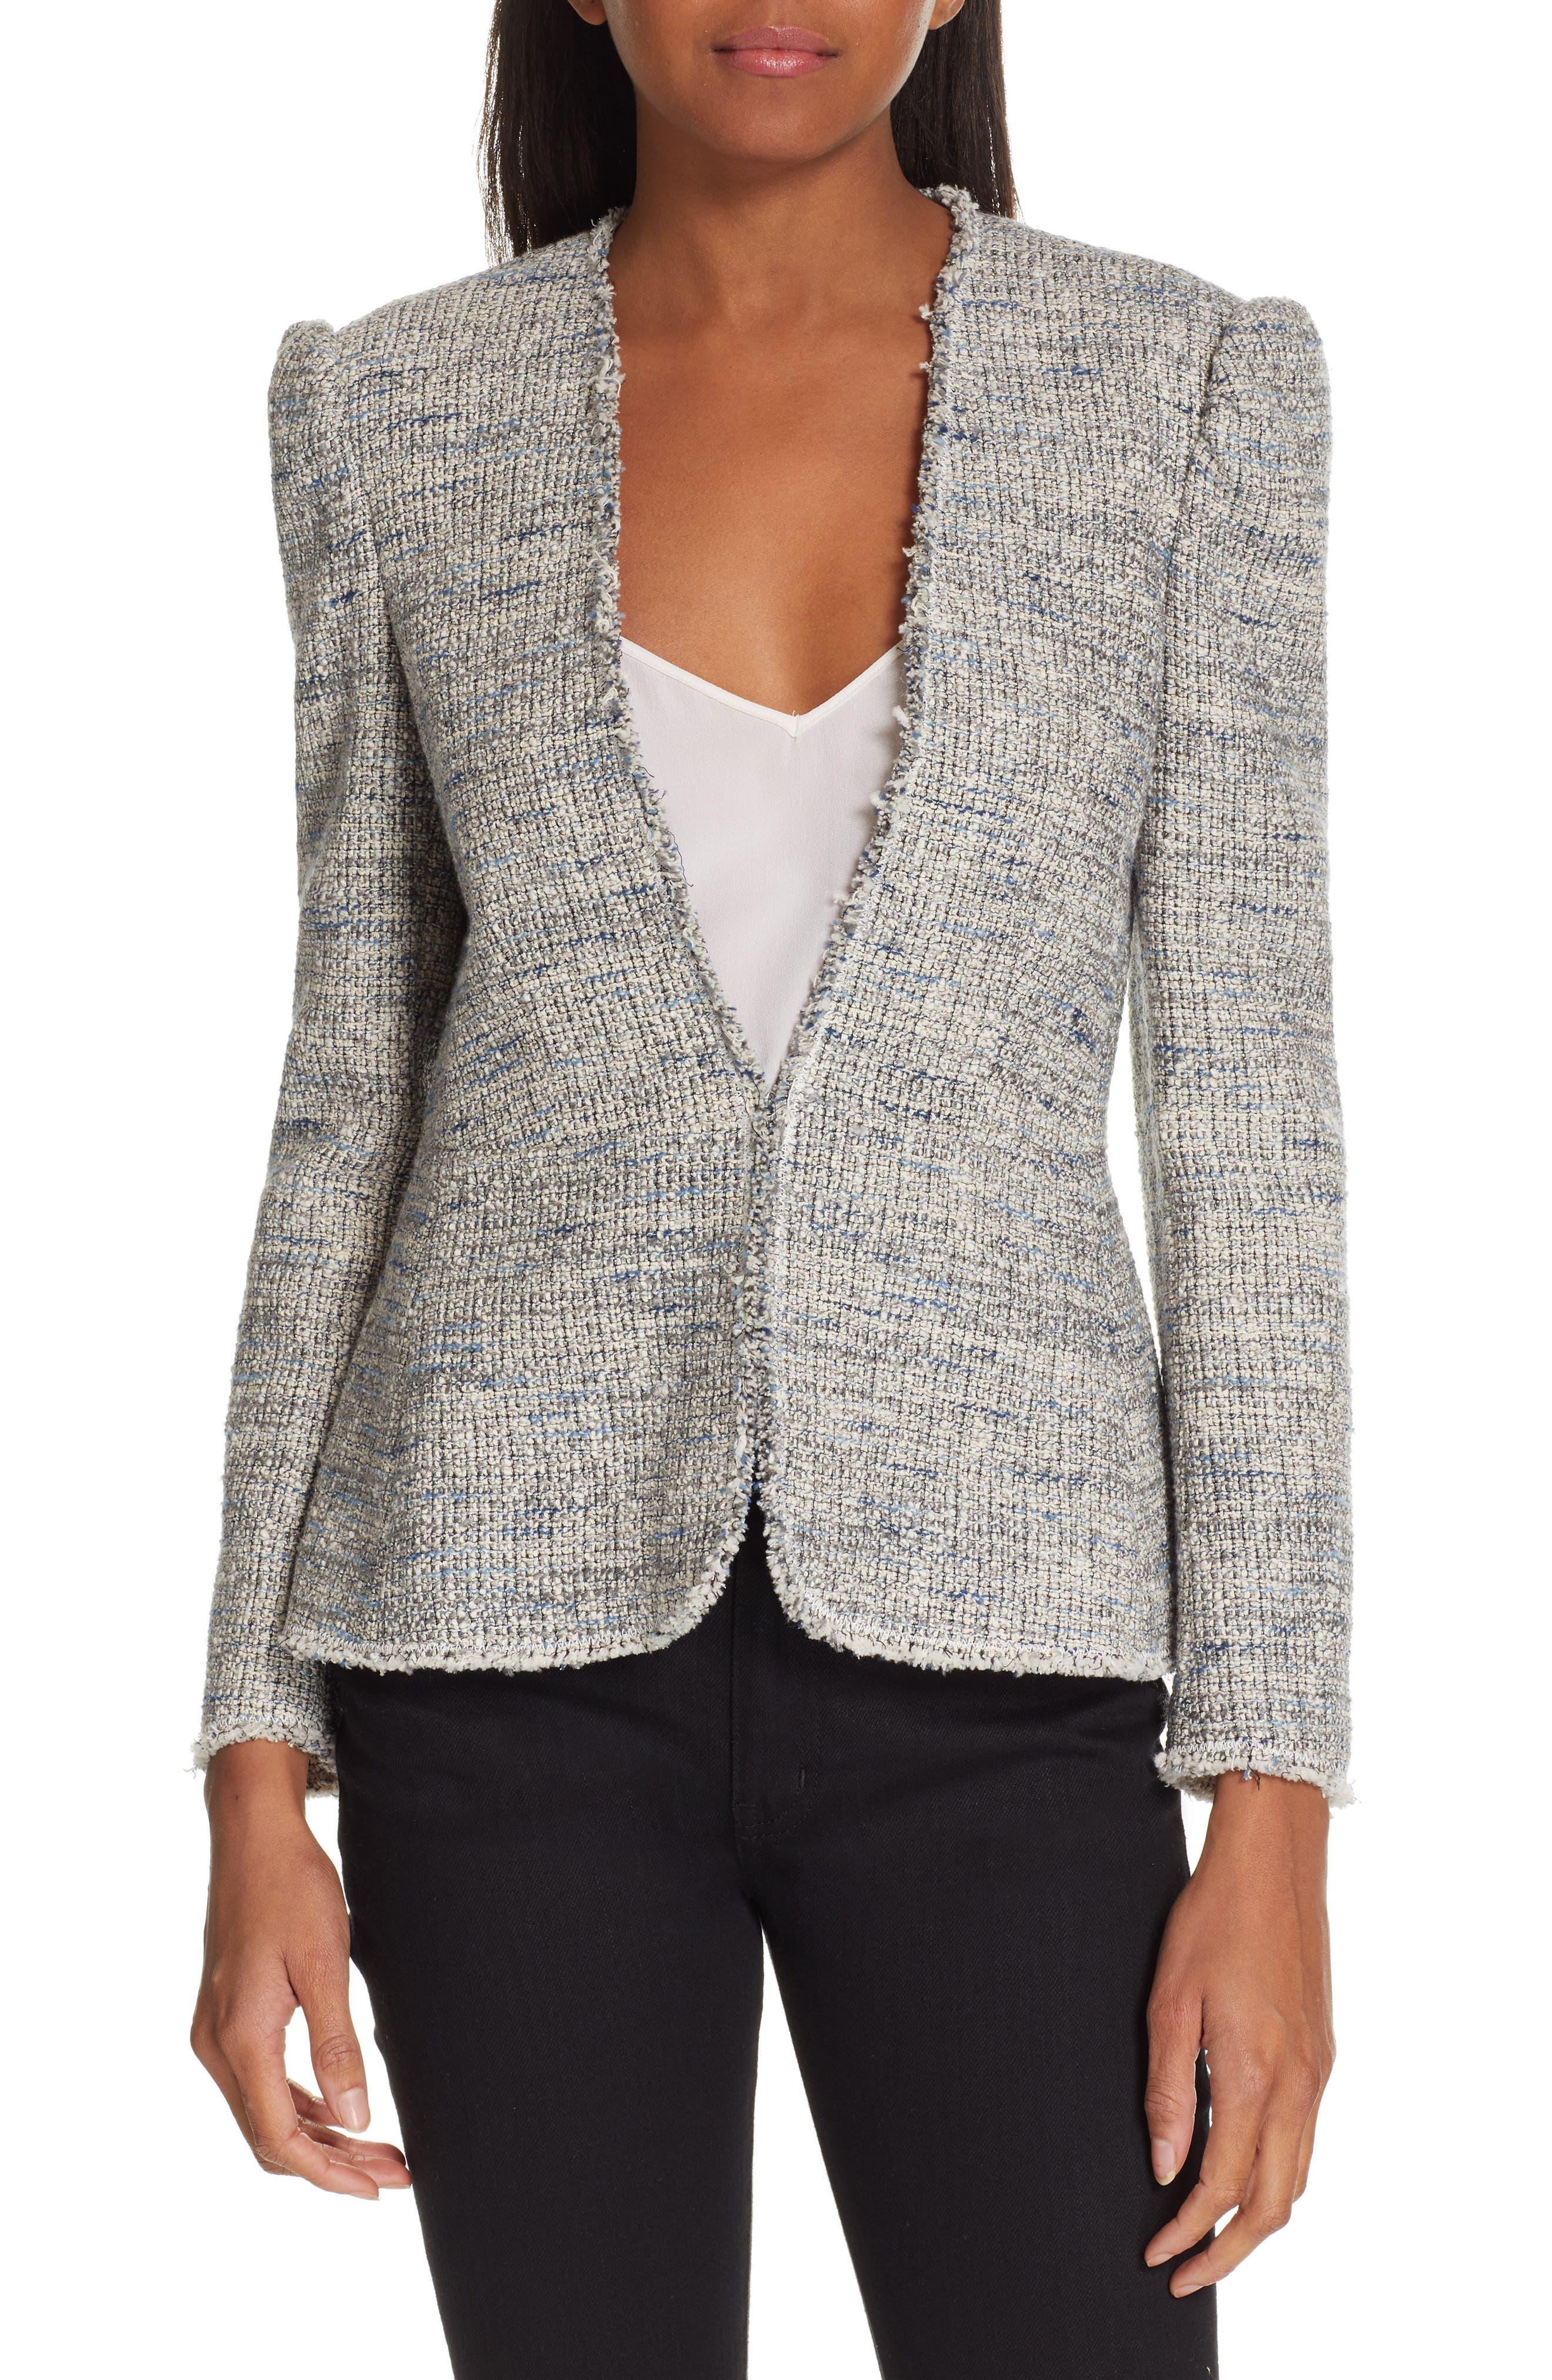 REBECCA TAYLOR Tweed Peplum Jacket, Main, color, BLUE/ GREY COMBO